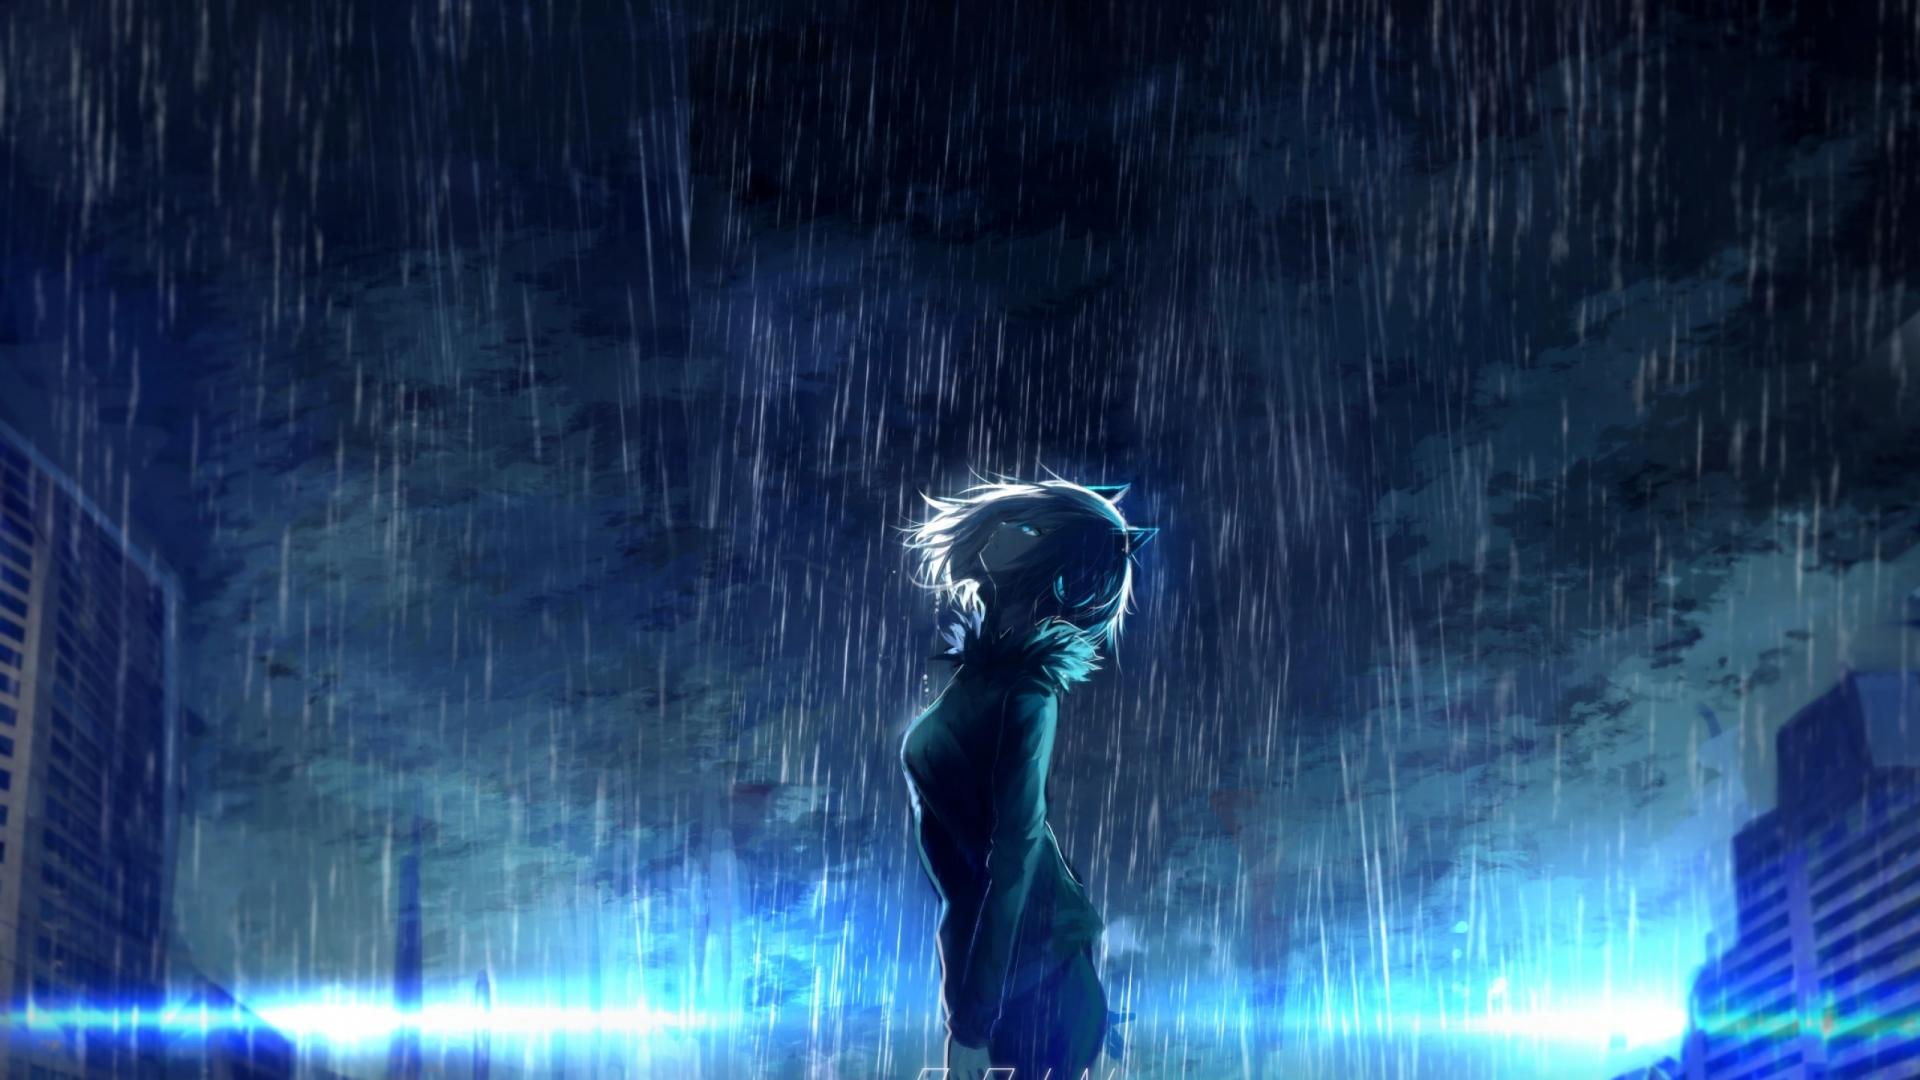 Free download Download 2560x1440 Anime Girl Scenic Raining ...